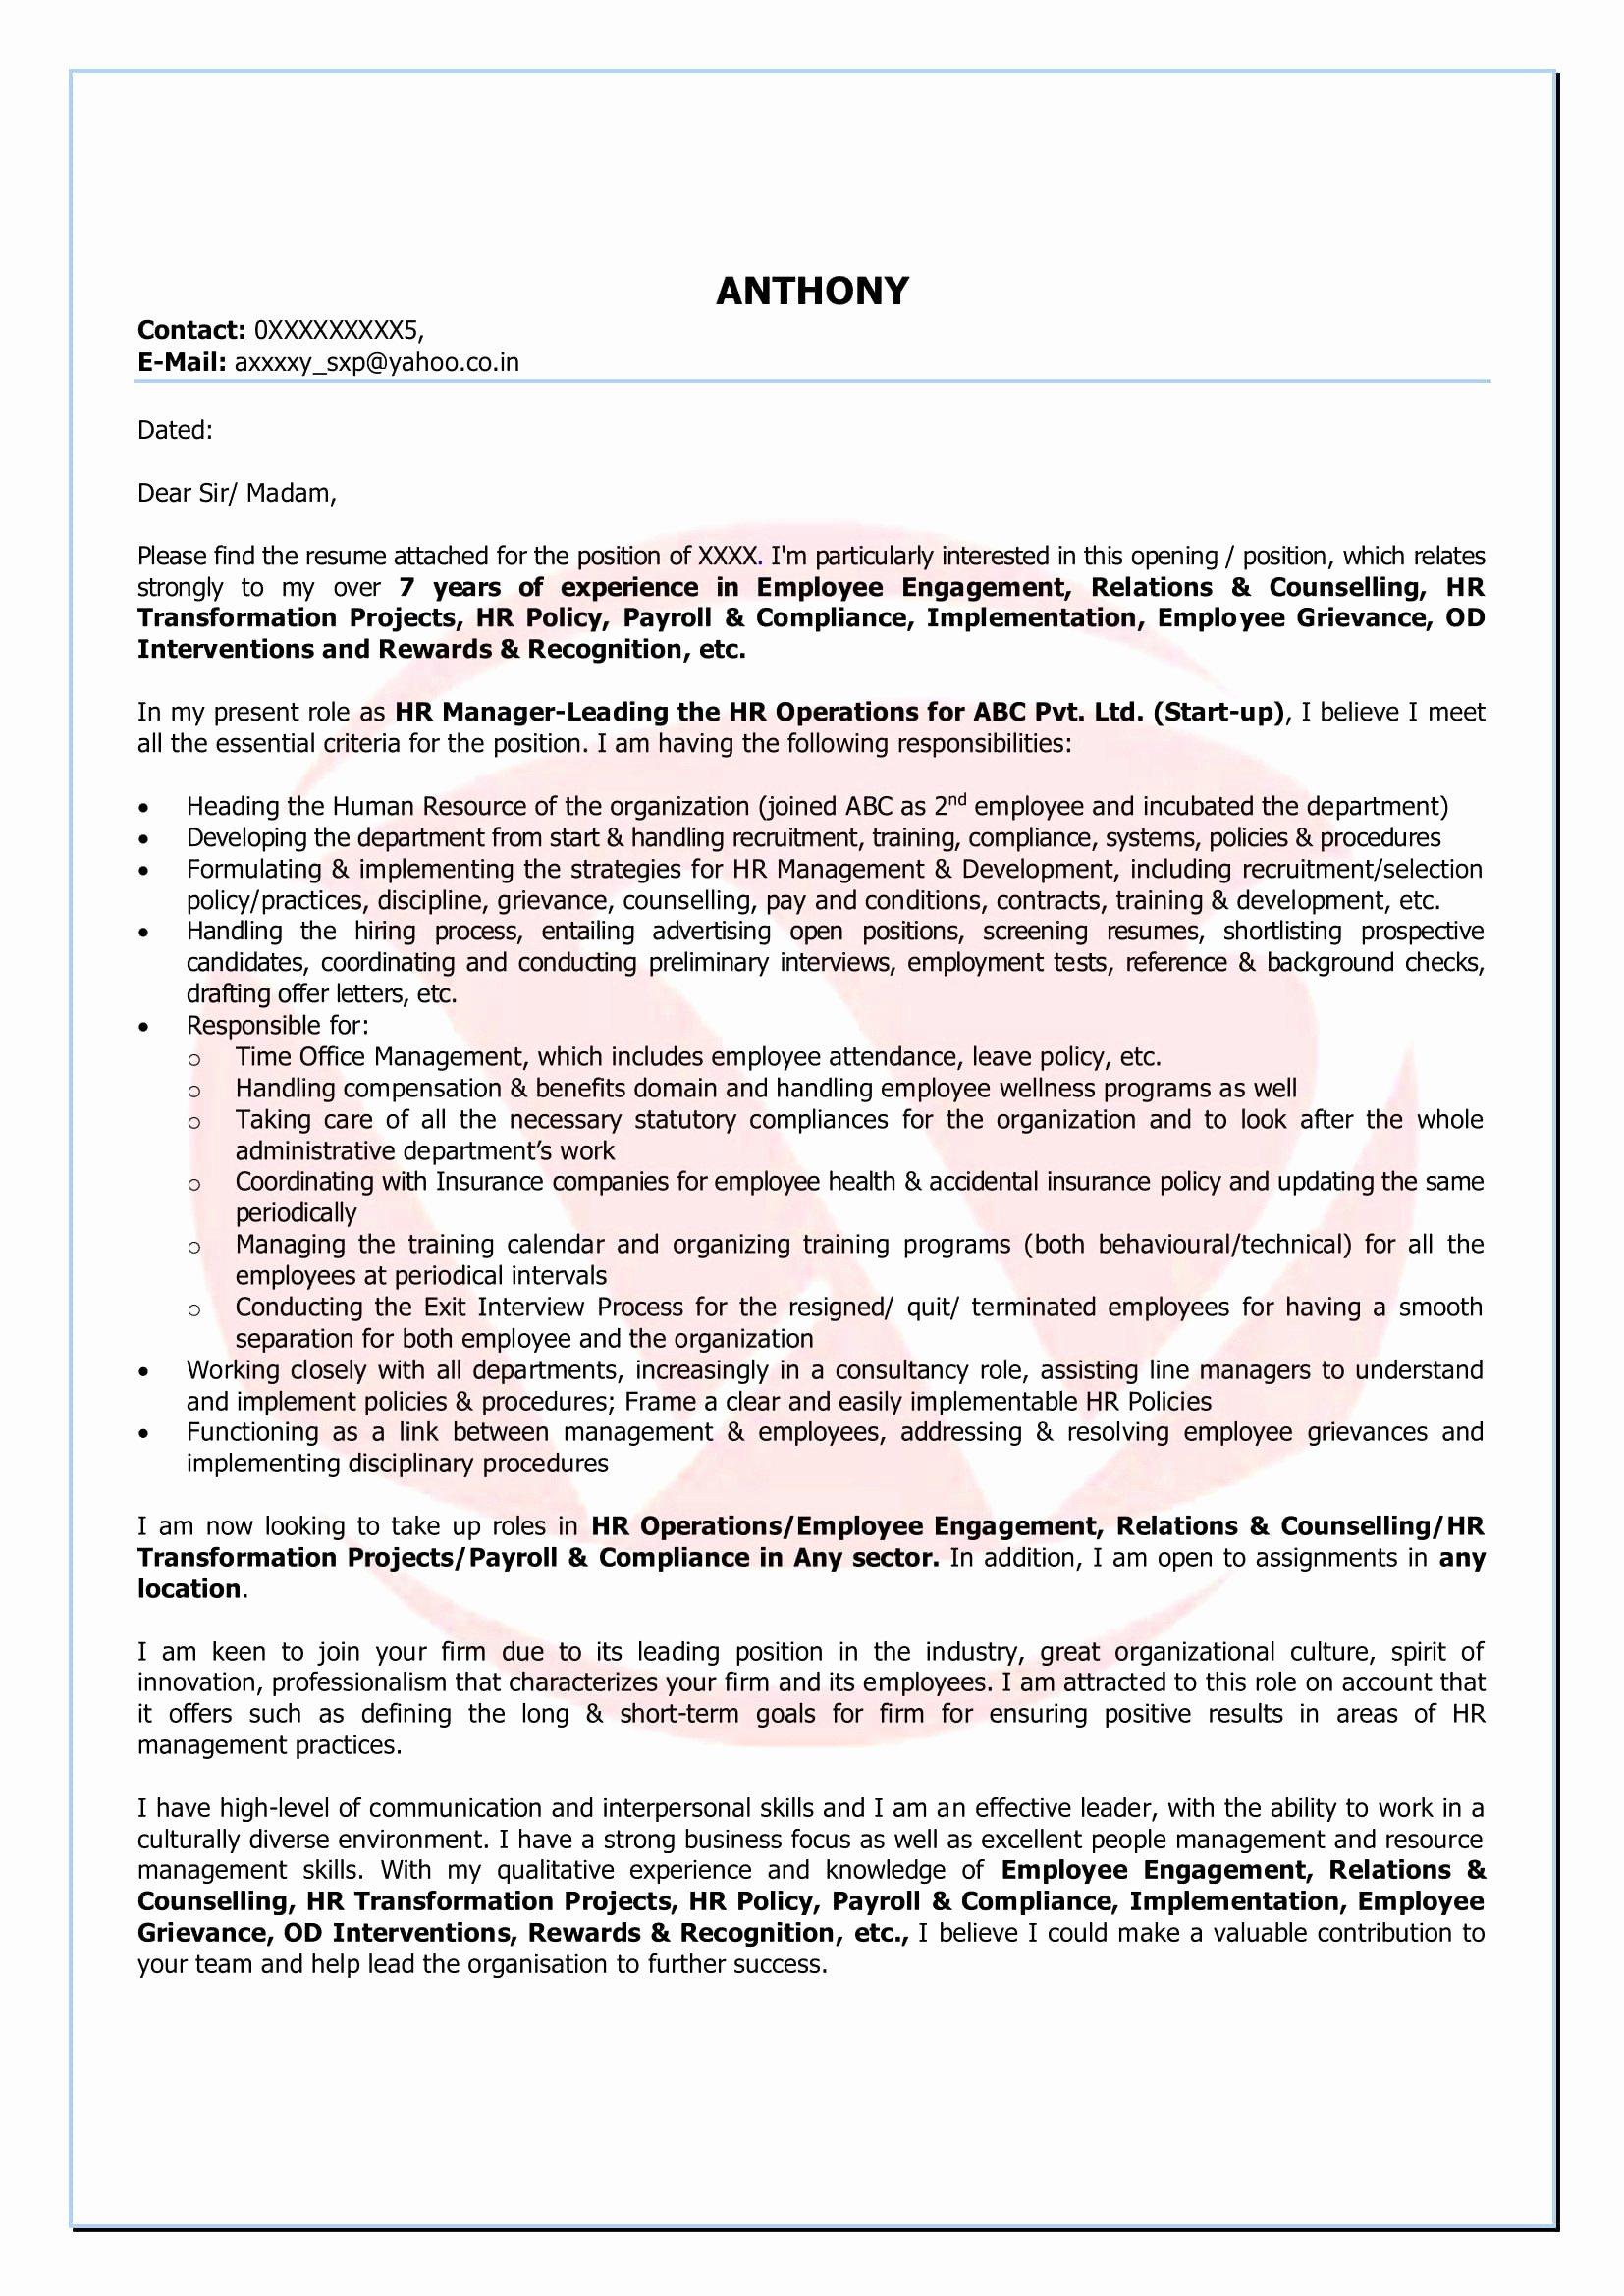 Letter Of Unemployment Template Fresh 11 Unemployment Appeal Letter Sample